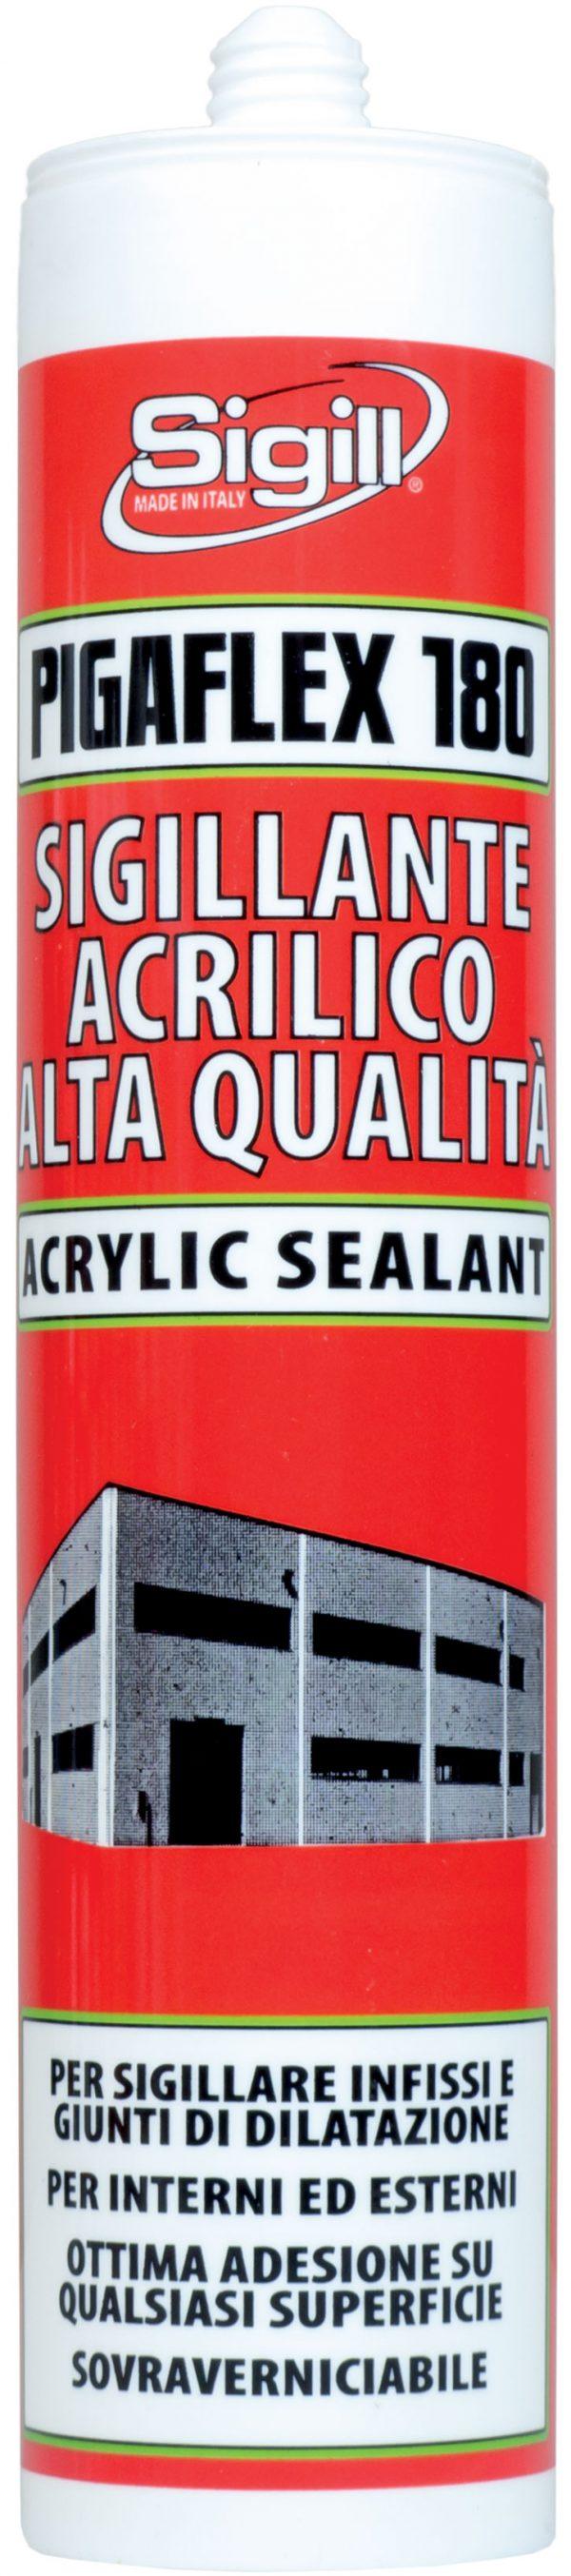 Acrylic sealant for building PIGAFLEX 180